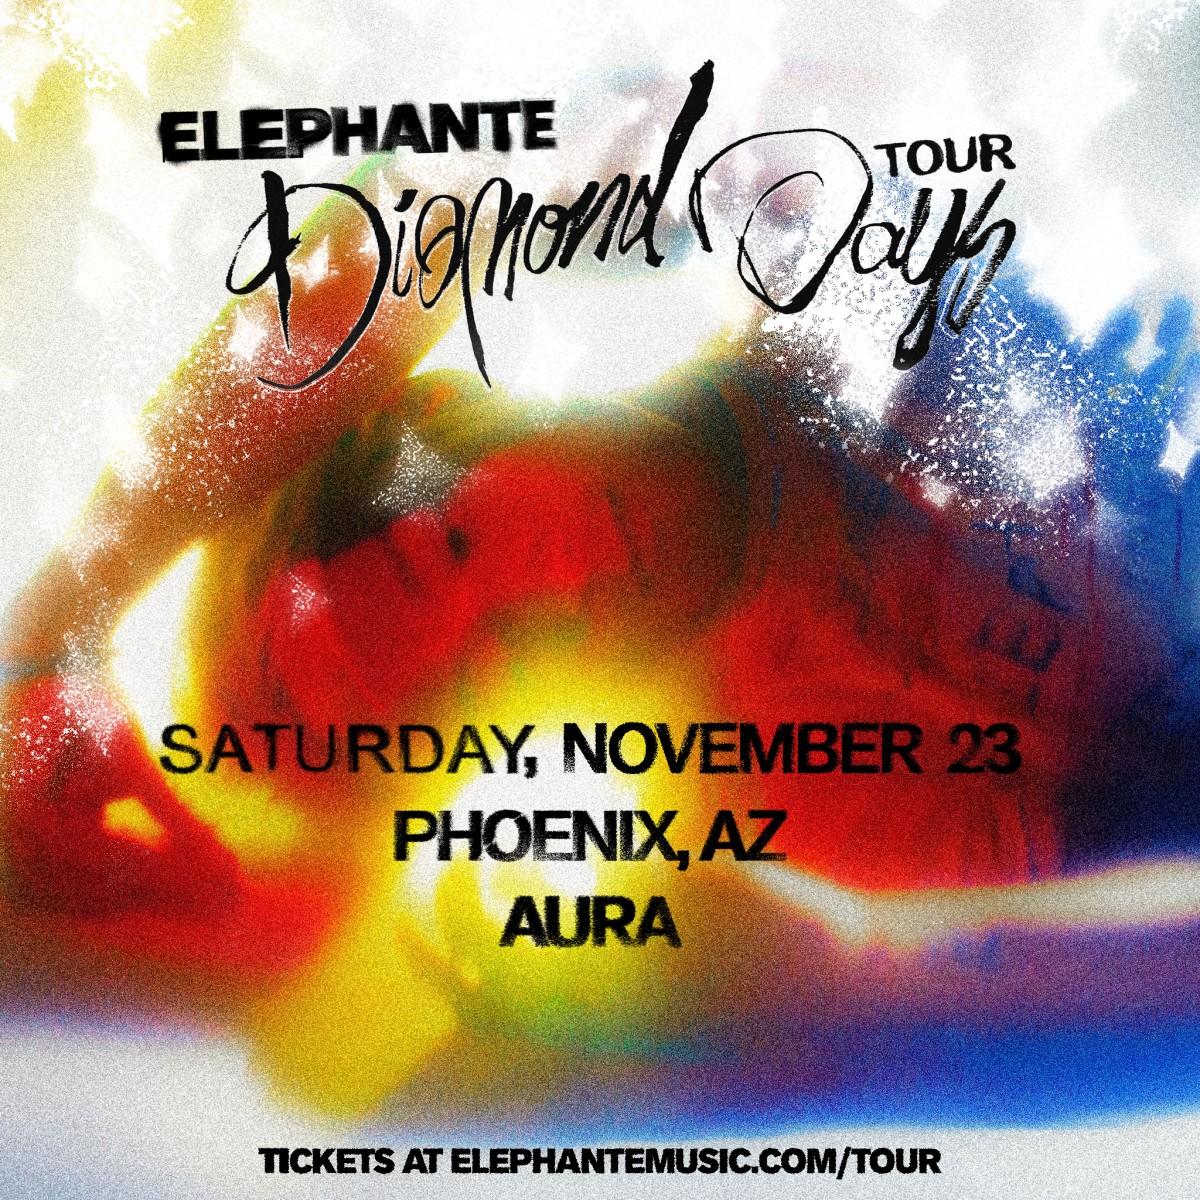 Flyer for Elephante